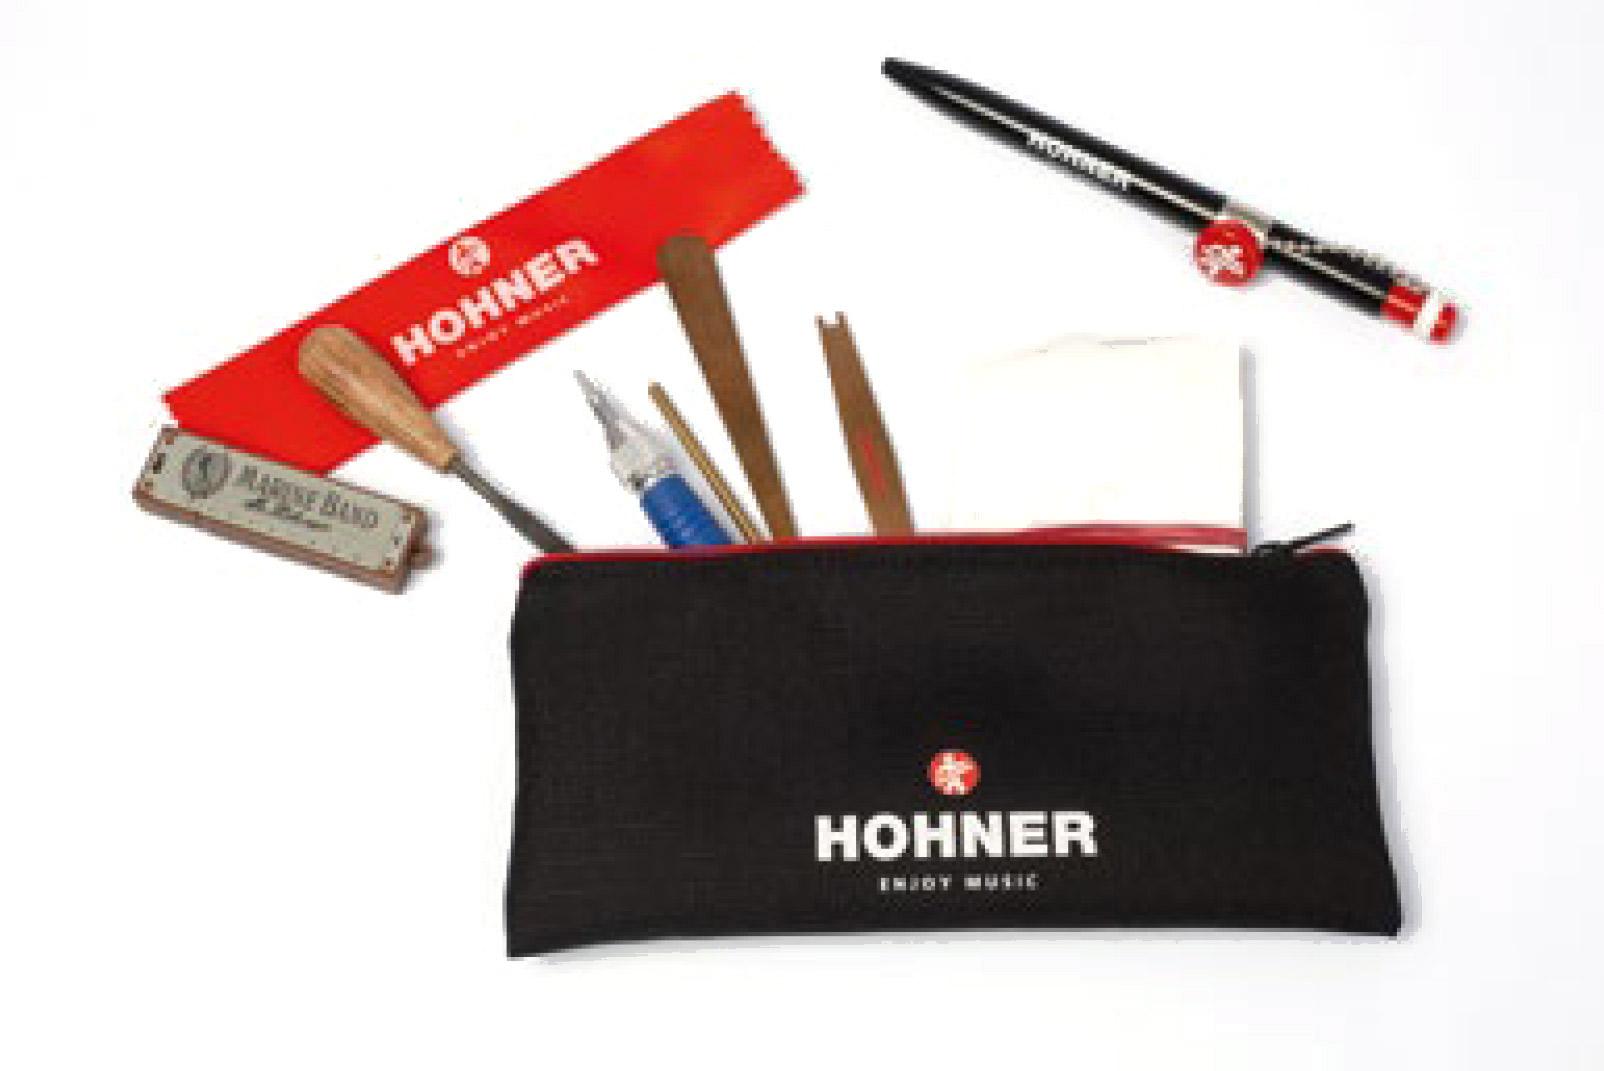 Hohner FlexCase L